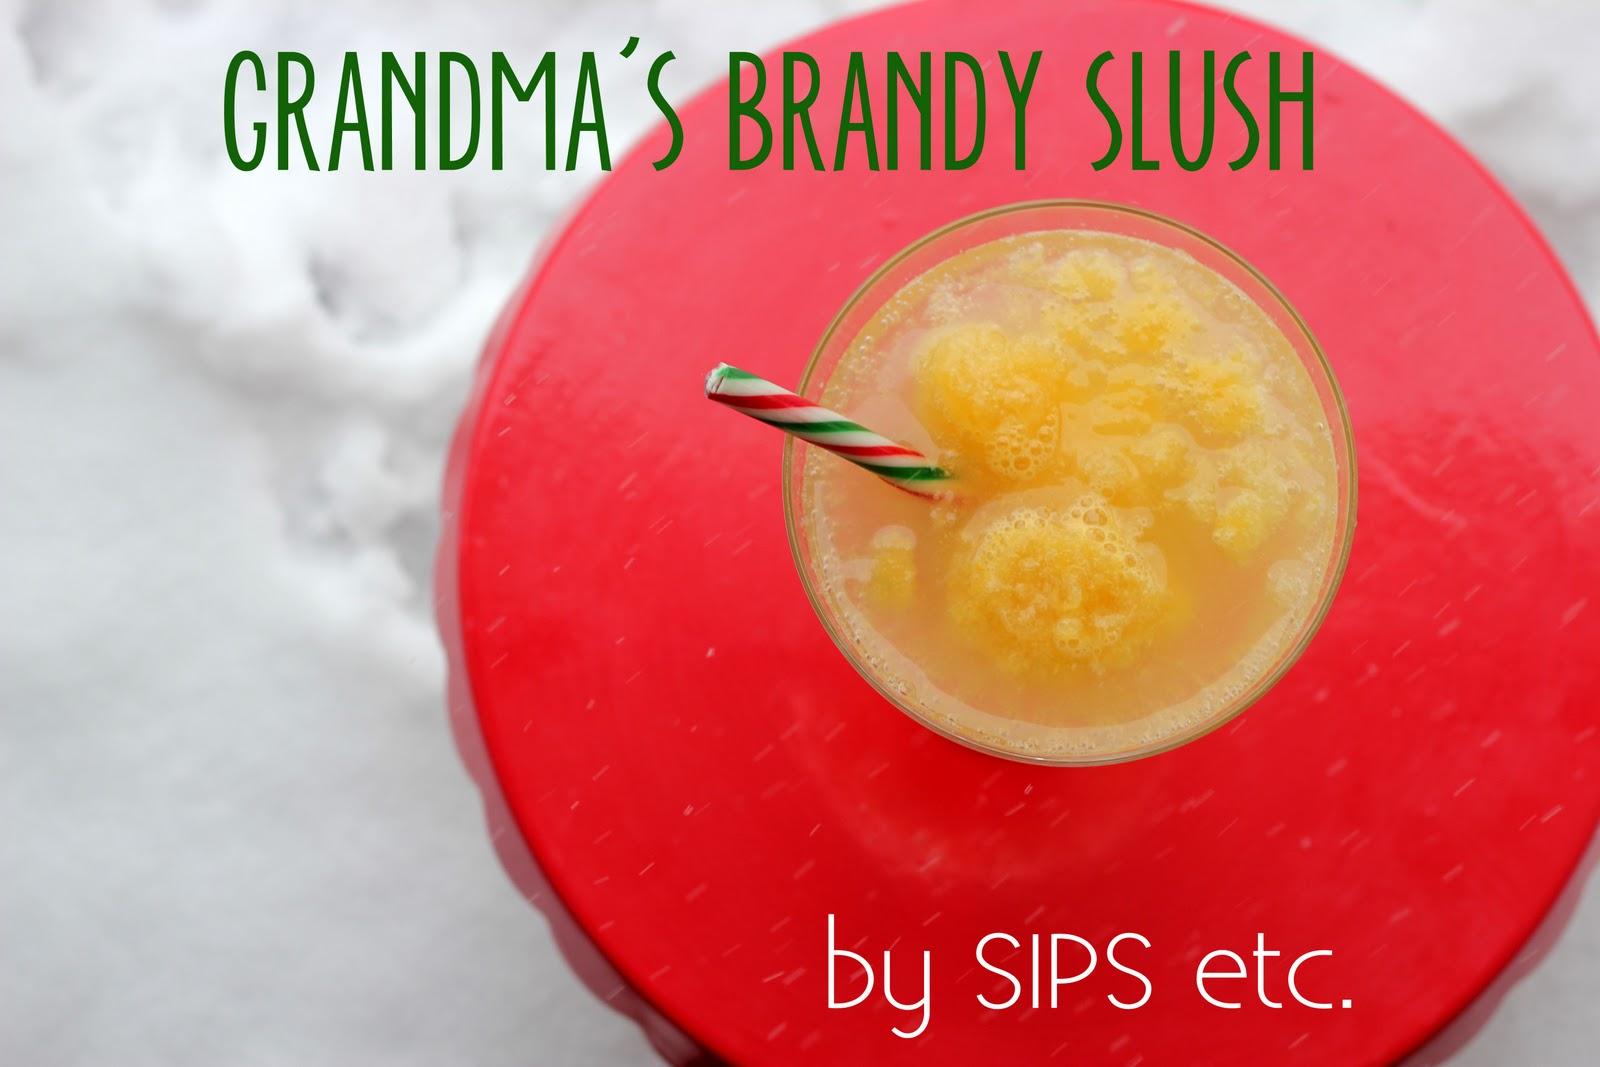 Sips Etc Best Christmas Drink Ever Grandma 39 S Brandy Slush